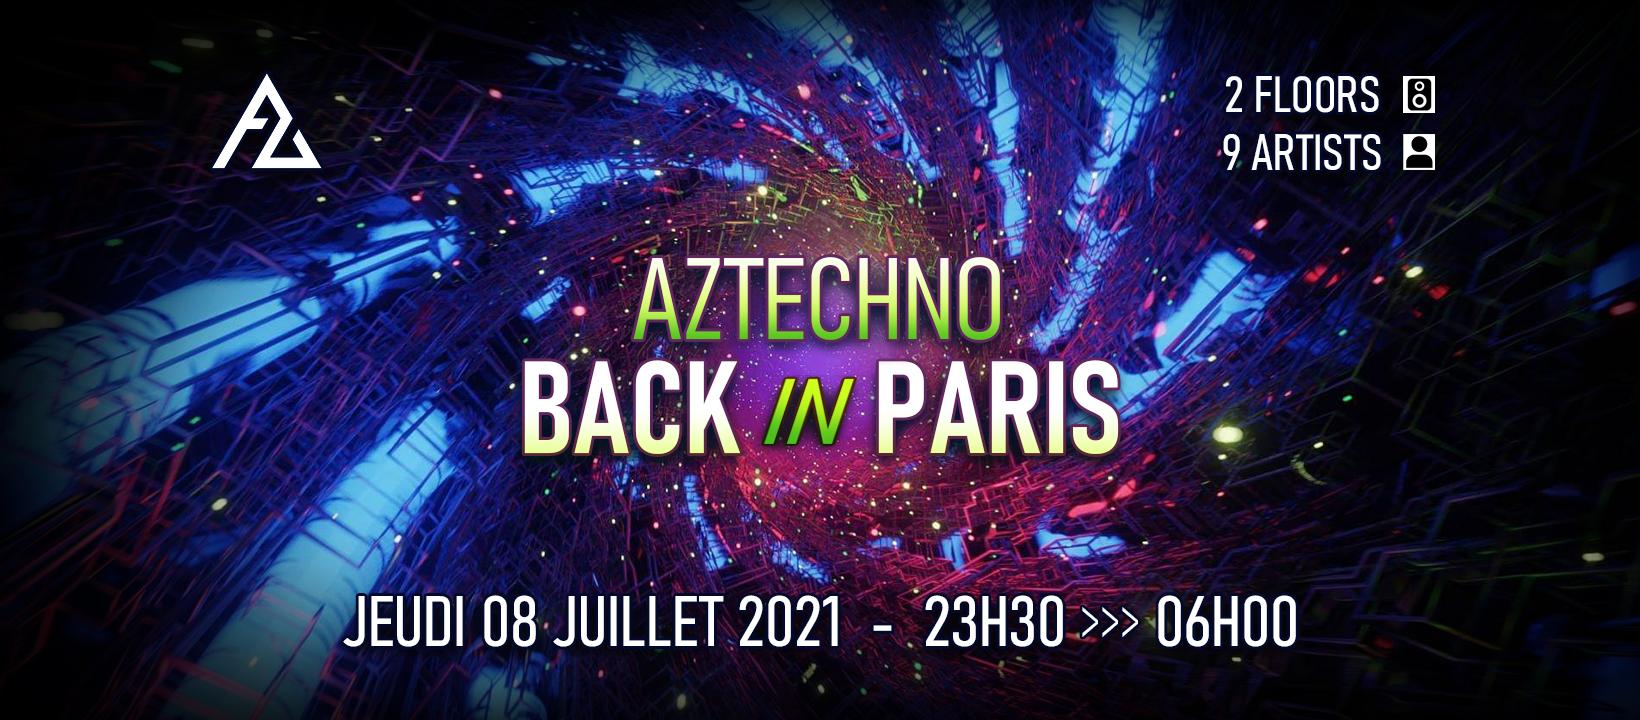 Aztechno back in Paris